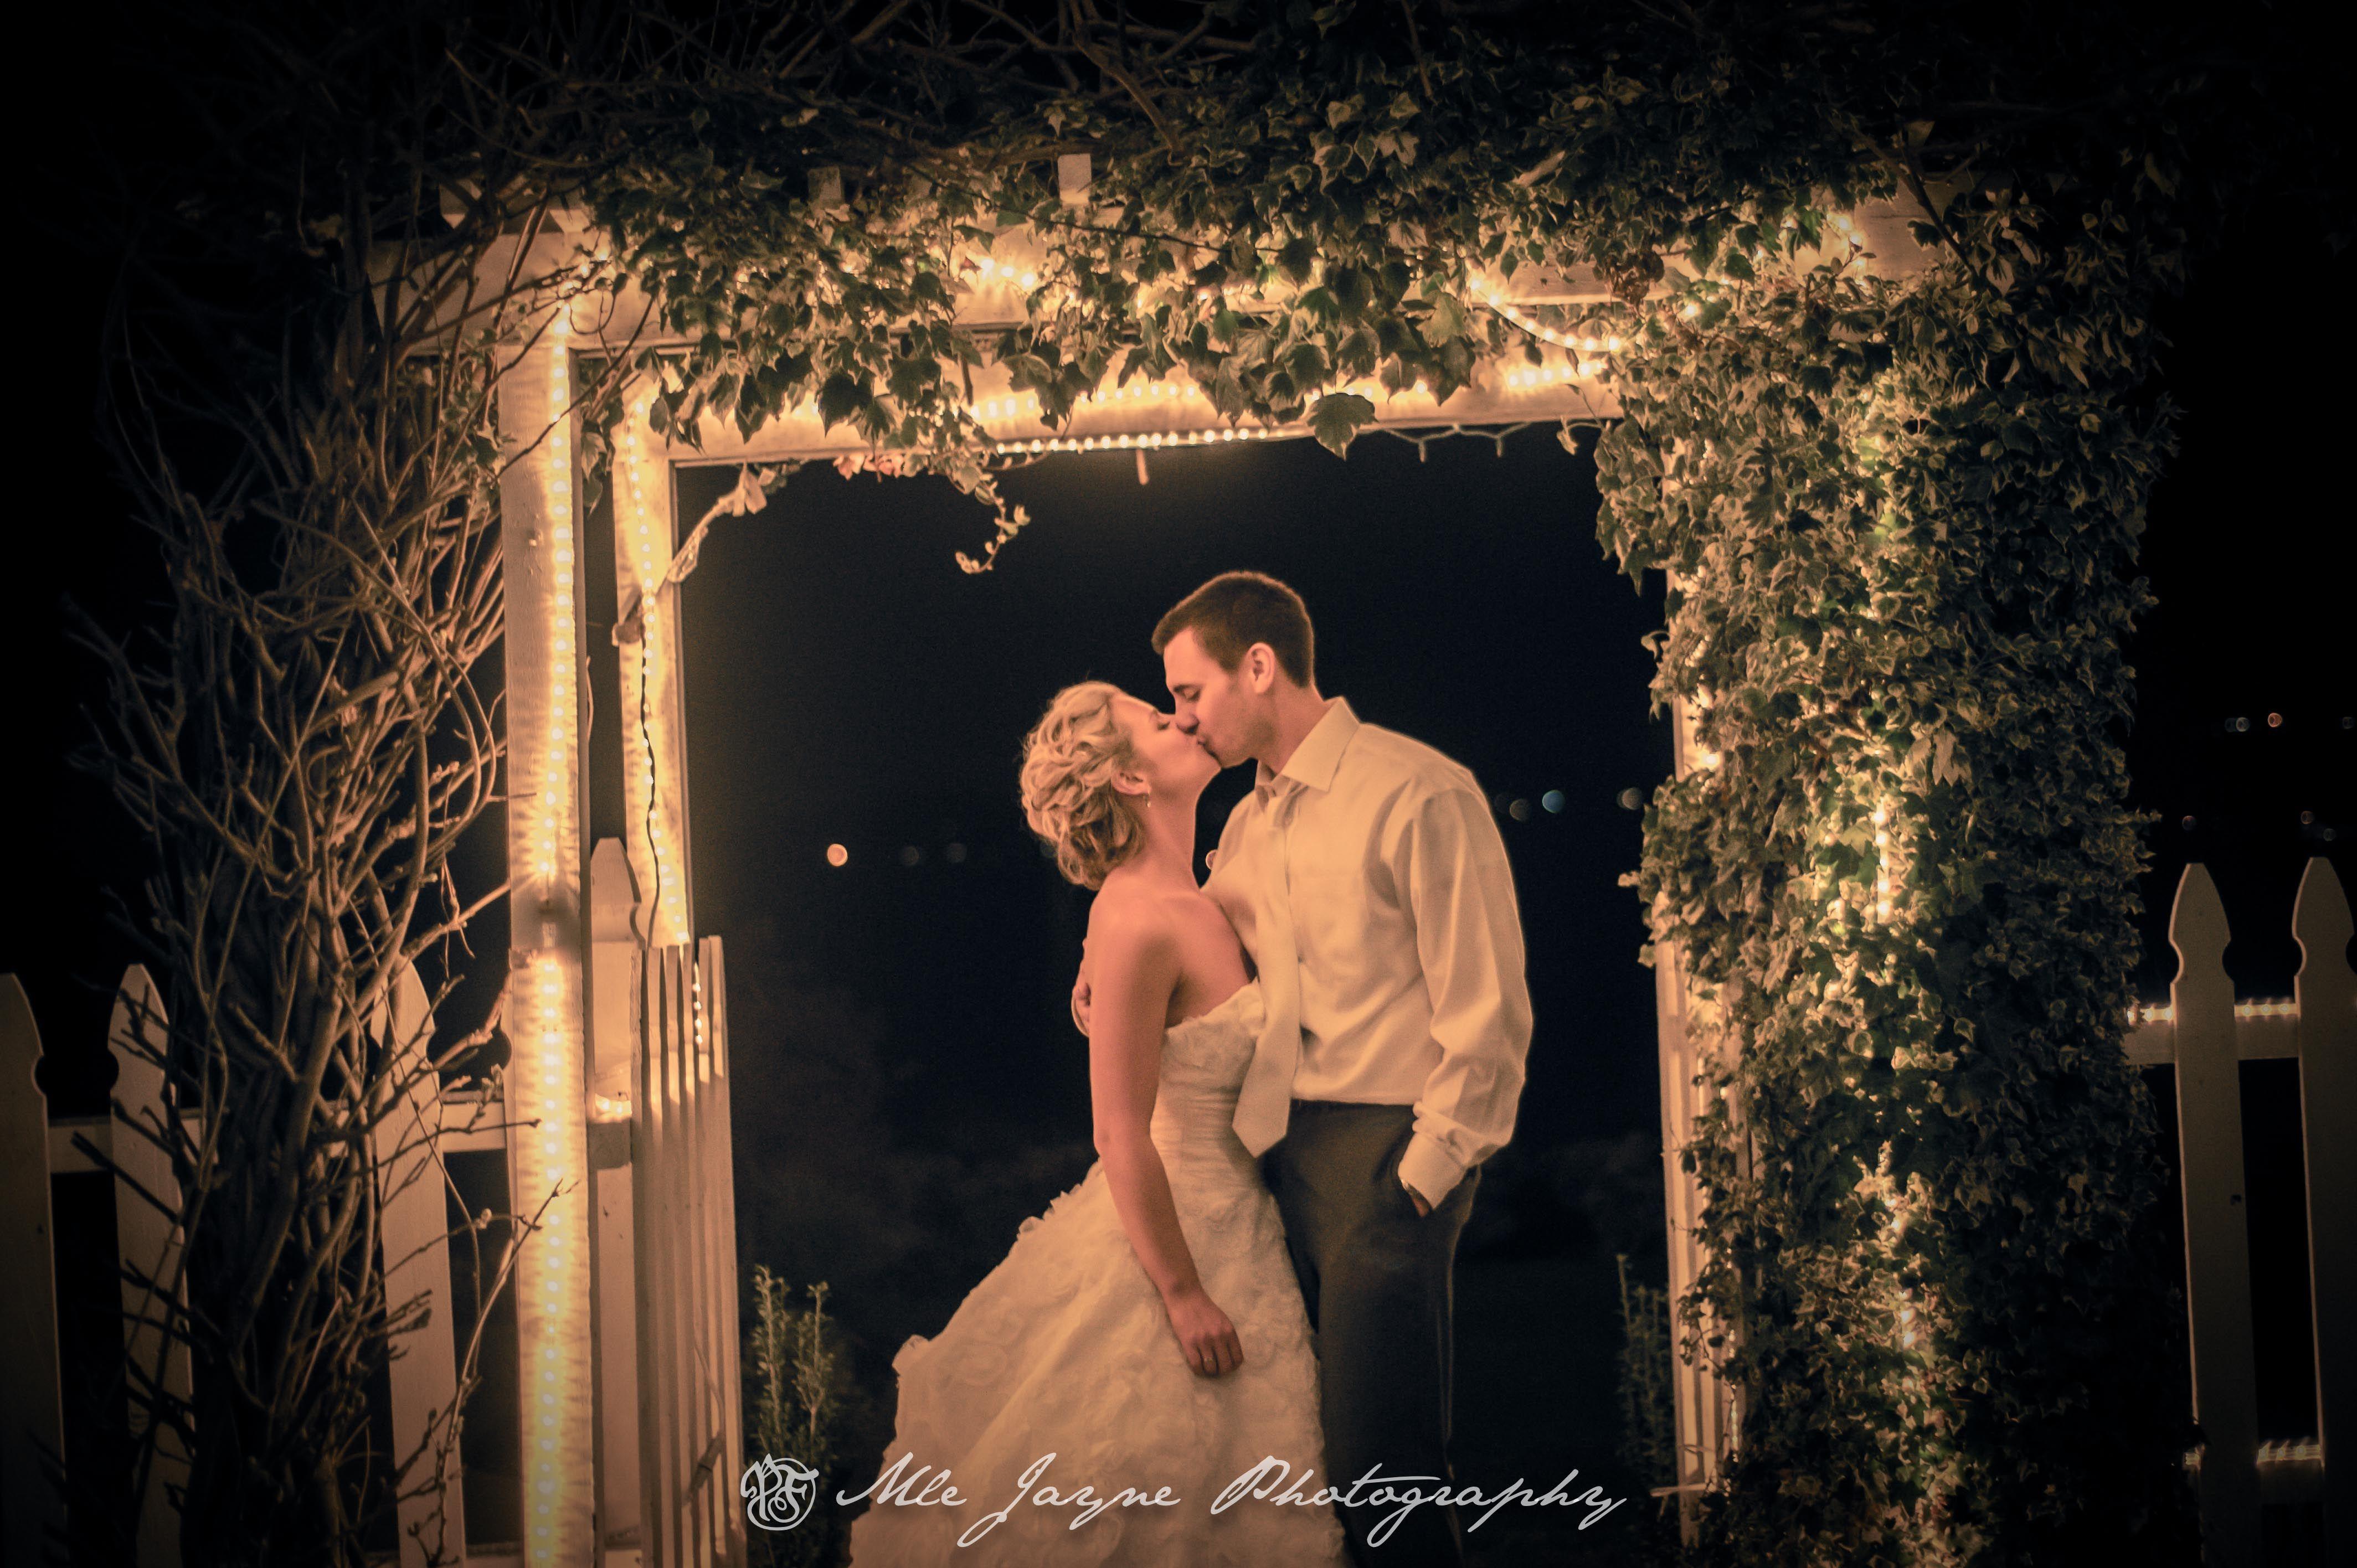 Elle liberachi wedding